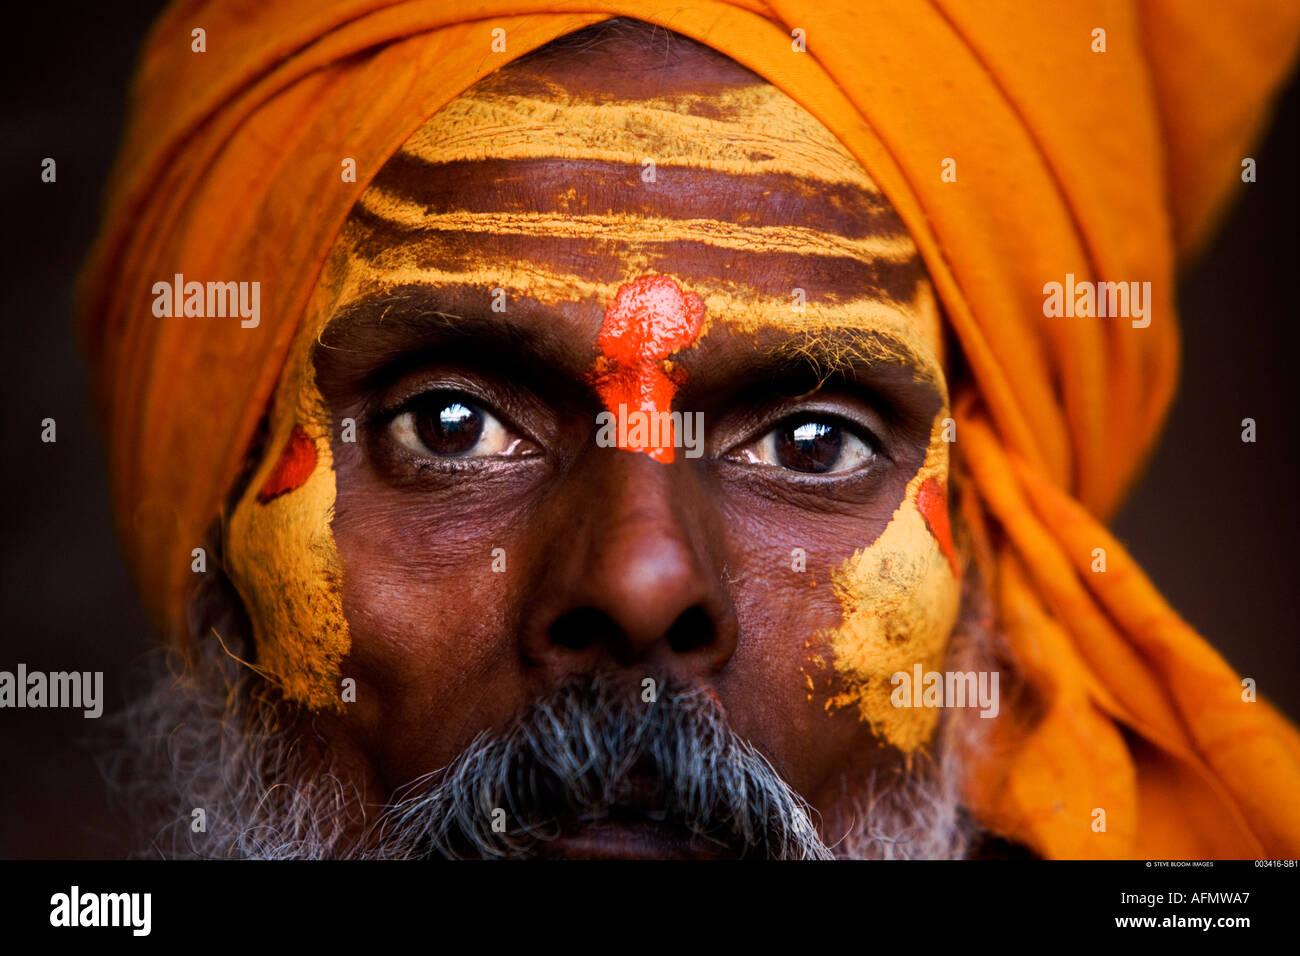 Sadhu santo homem Varanasi Índia Imagens de Stock